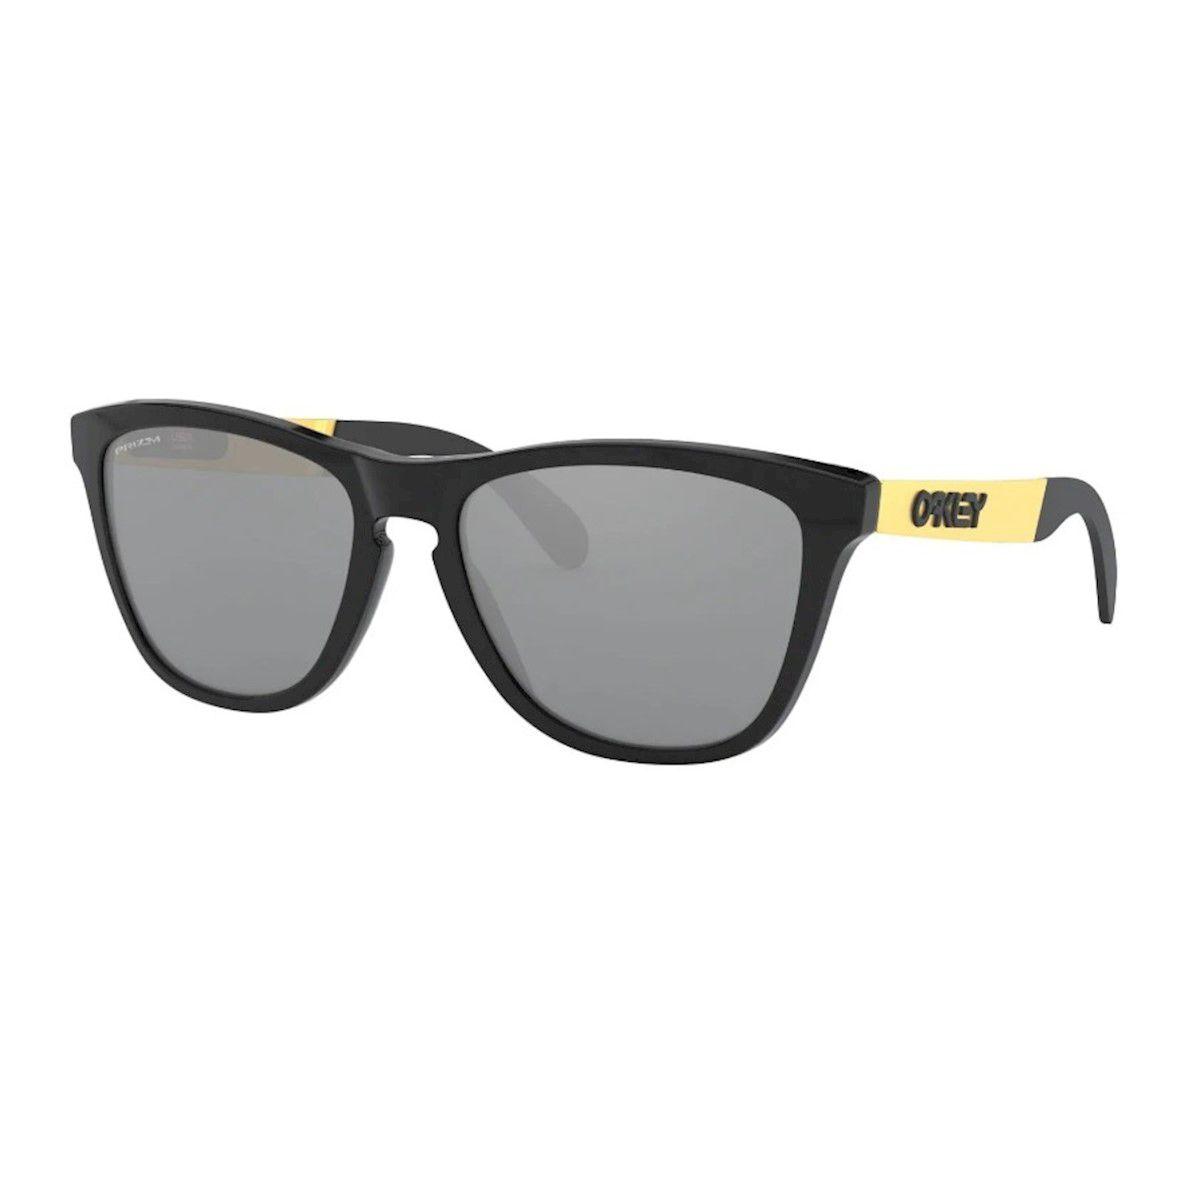 Óculos de Sol Oakley Frogskins Mix Prizm Black Iridium